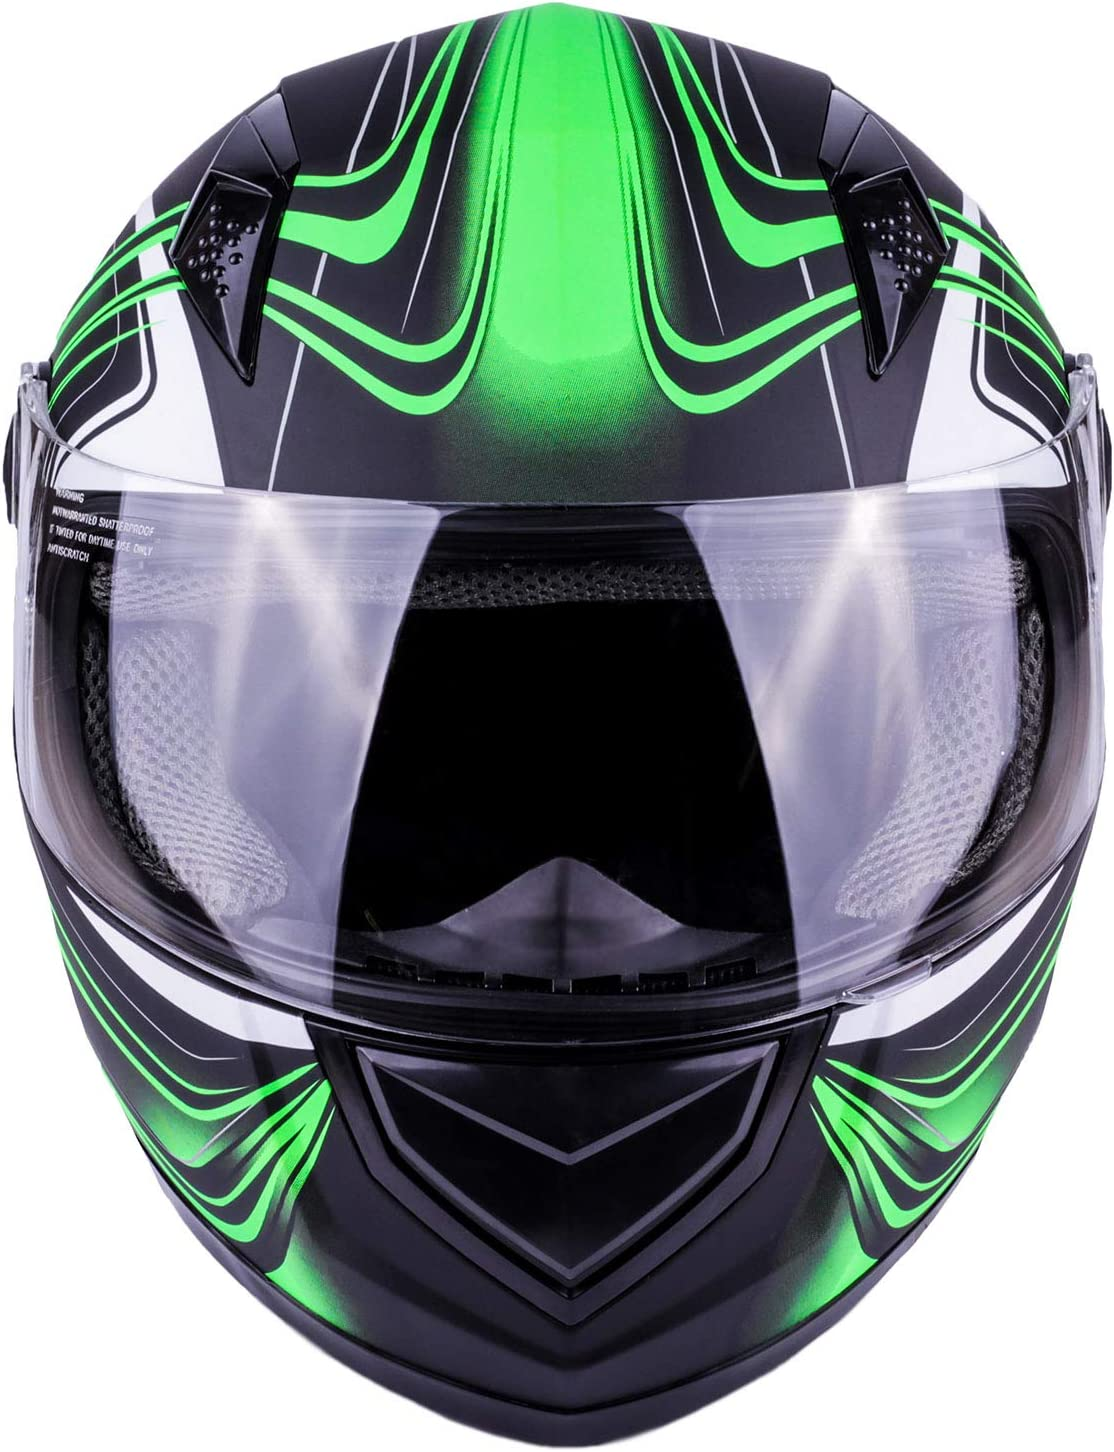 SAME DAY SHIPPING Matte Black, XXXXL Typhoon Adult Full Face Motorcycle Helmet DOT